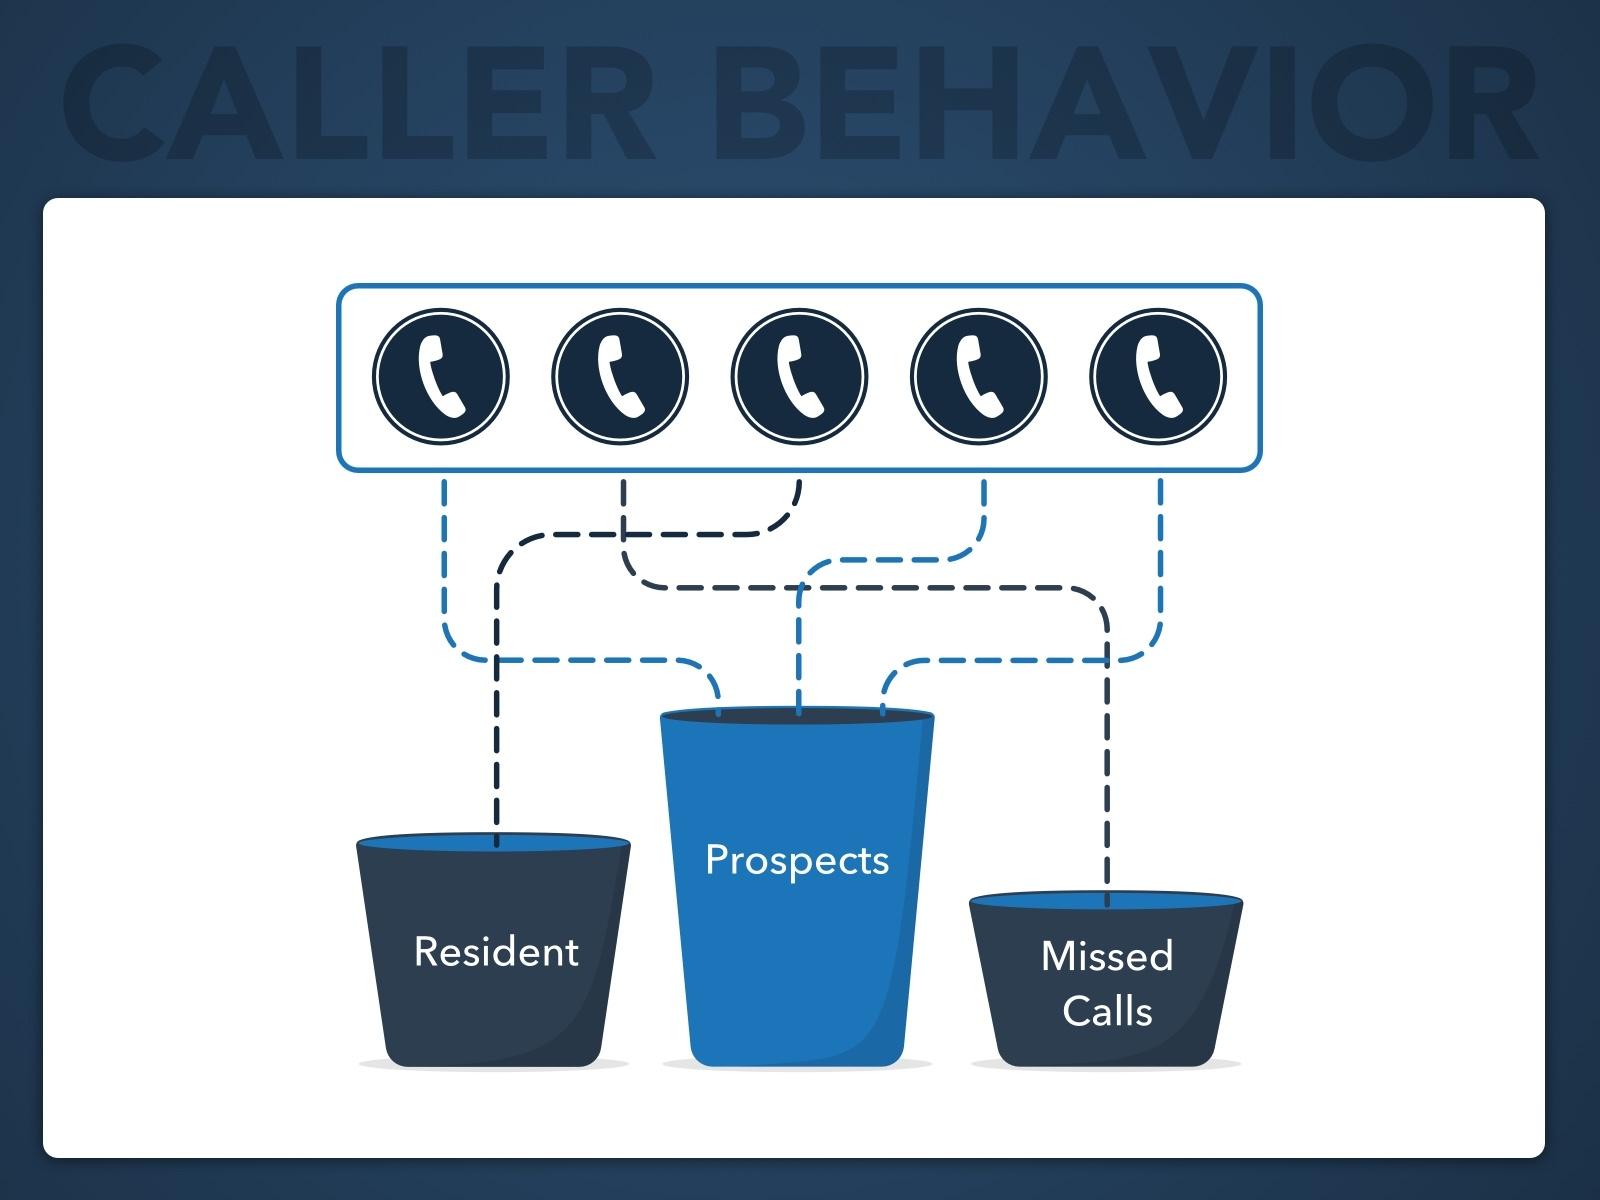 Leasehawk product graphic caller behavior